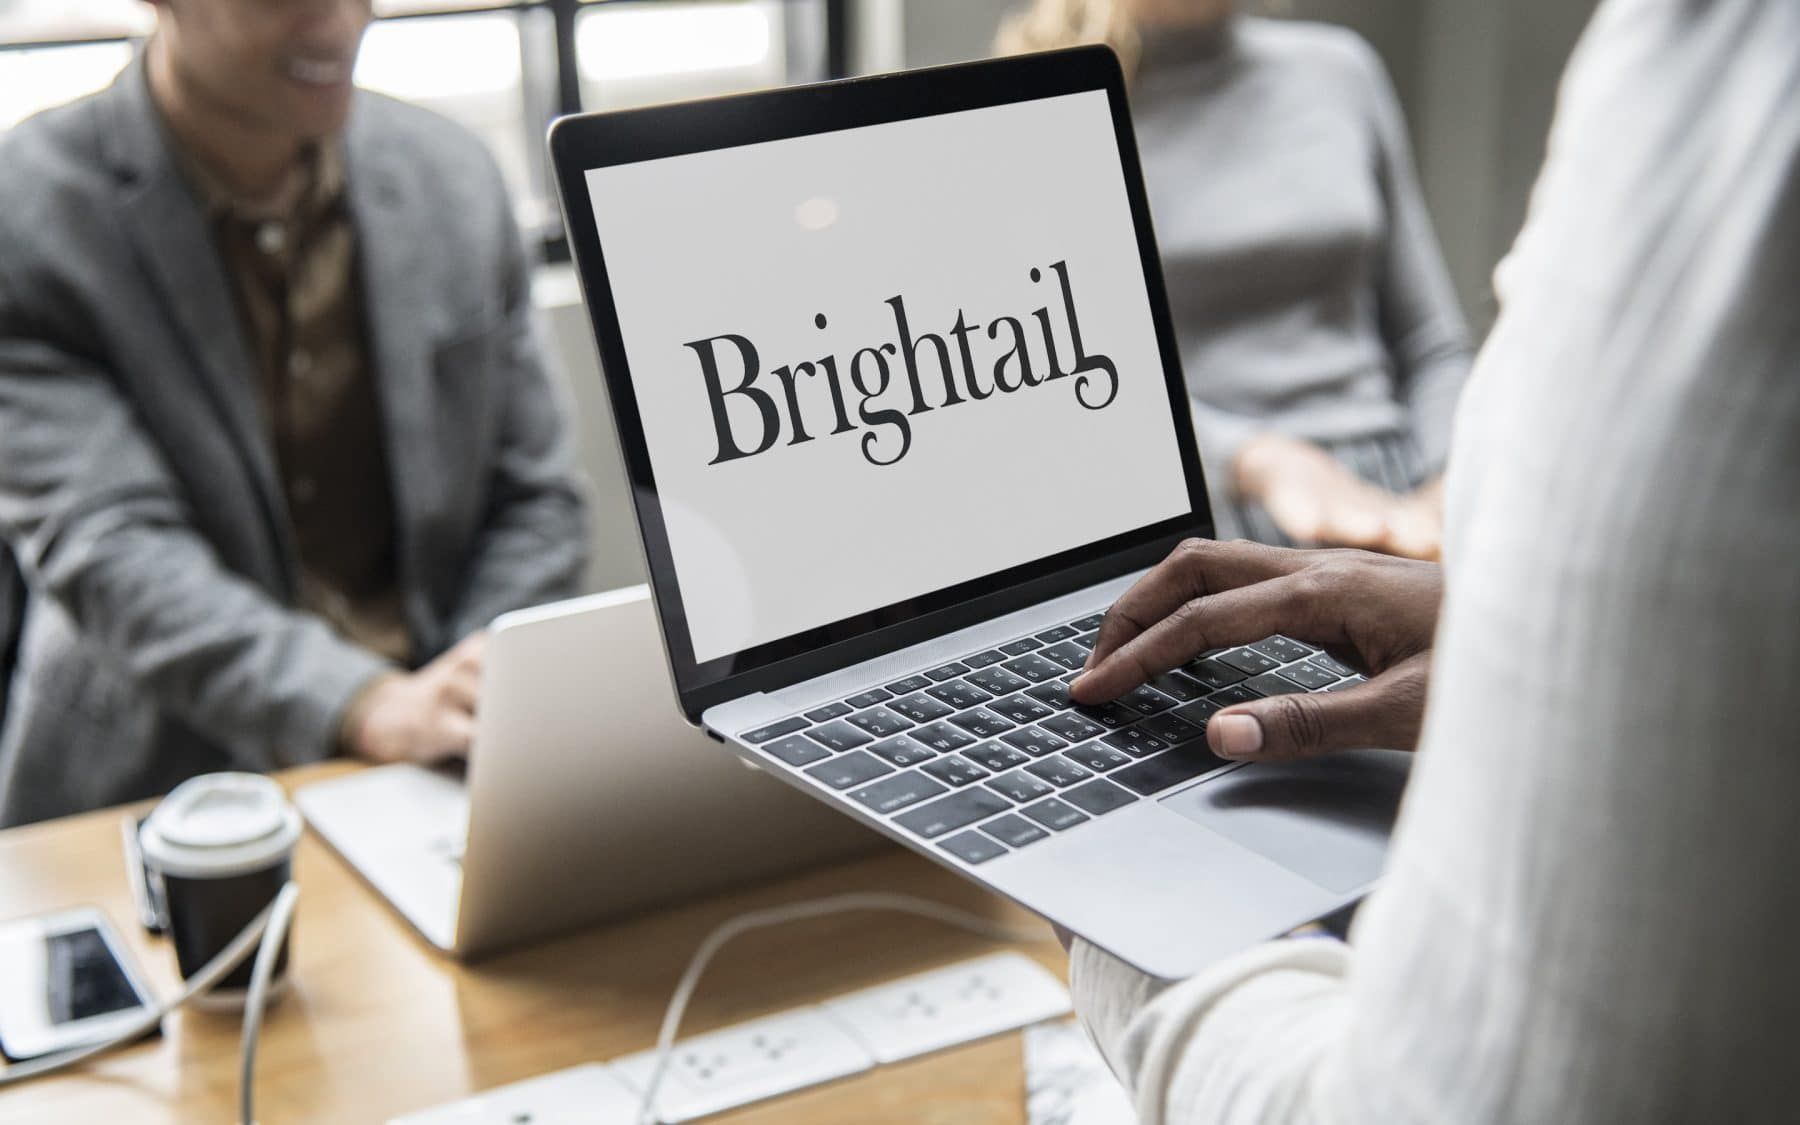 Brightail